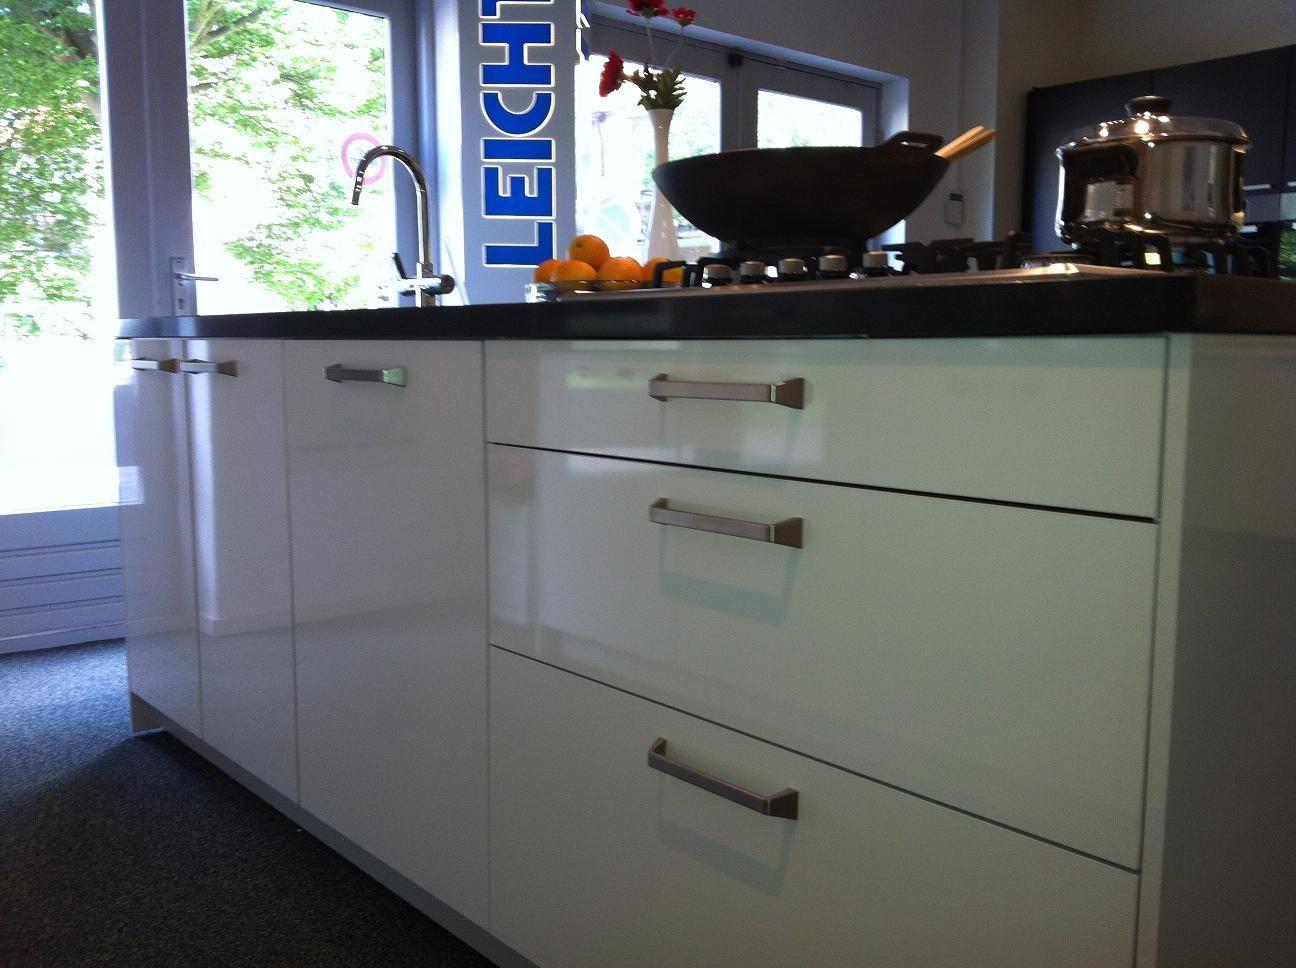 Leicht Keuken Met Betonnen Fronten : Prachtige Leicht keuken met ...